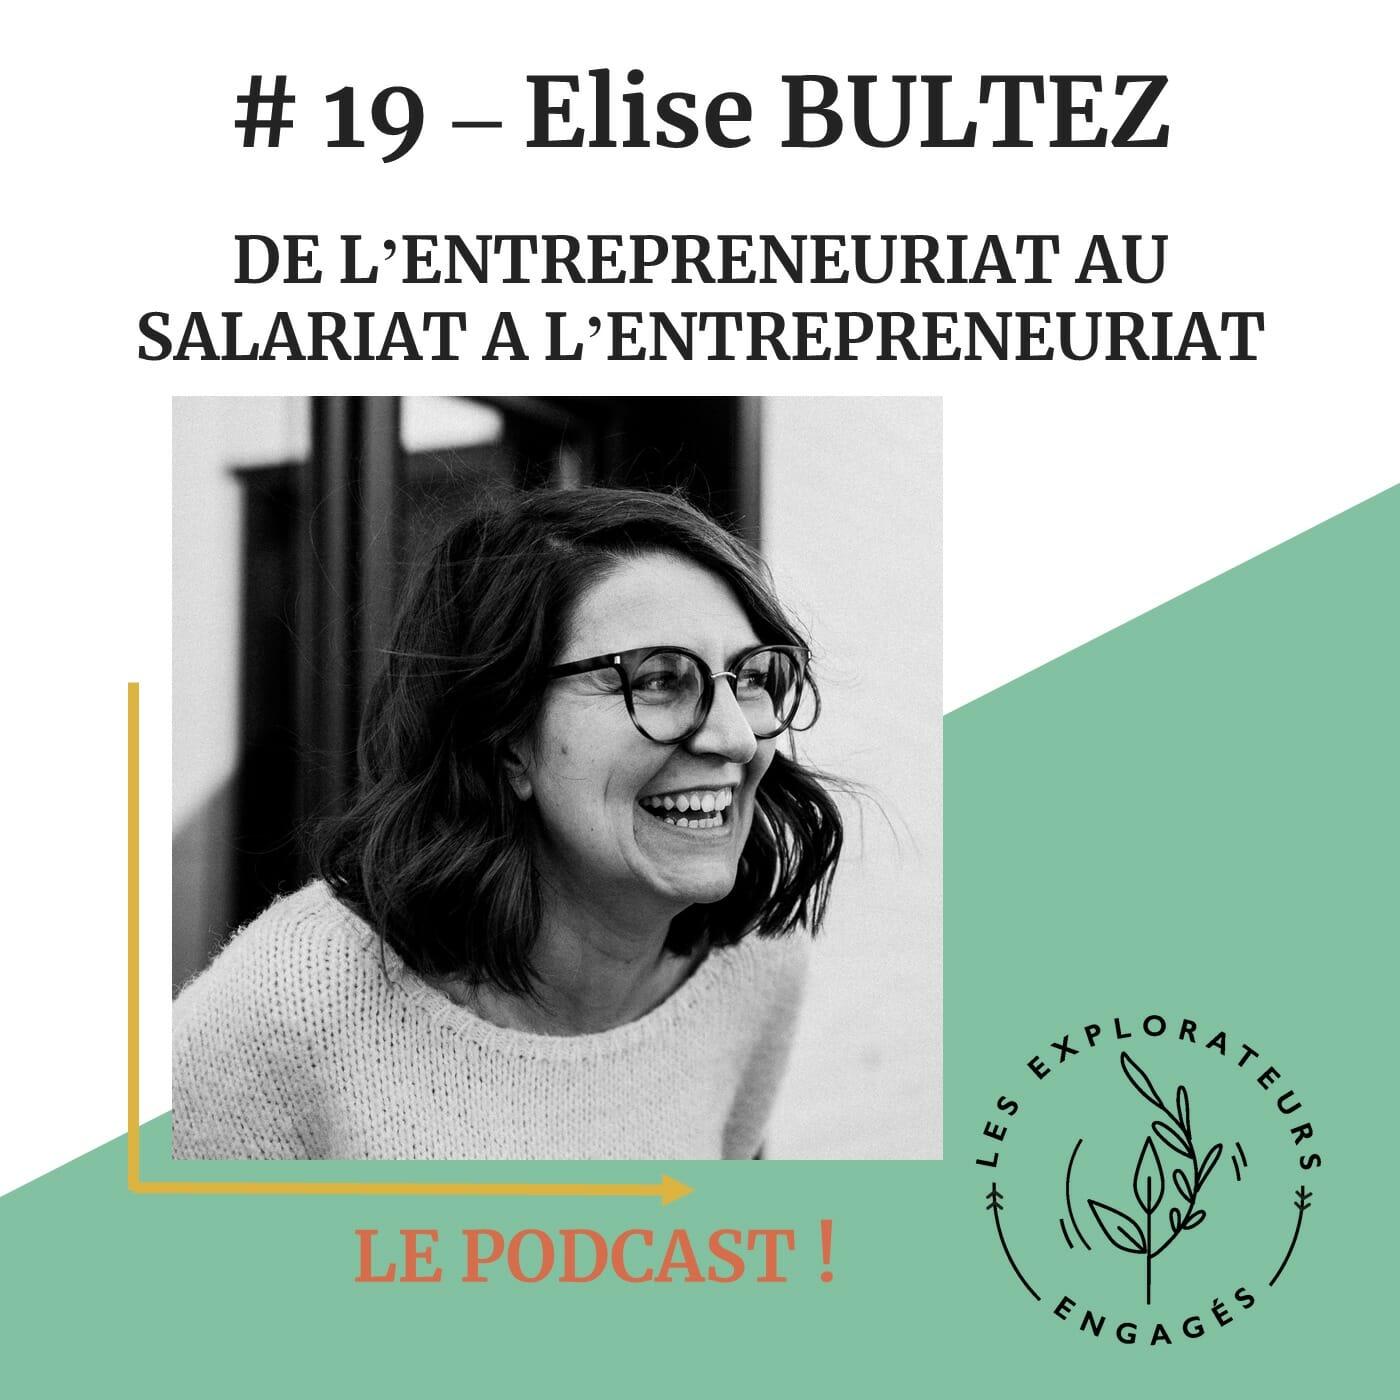 You are currently viewing #19 Elise Bultez – Retourner vers l'entrepreneuriat